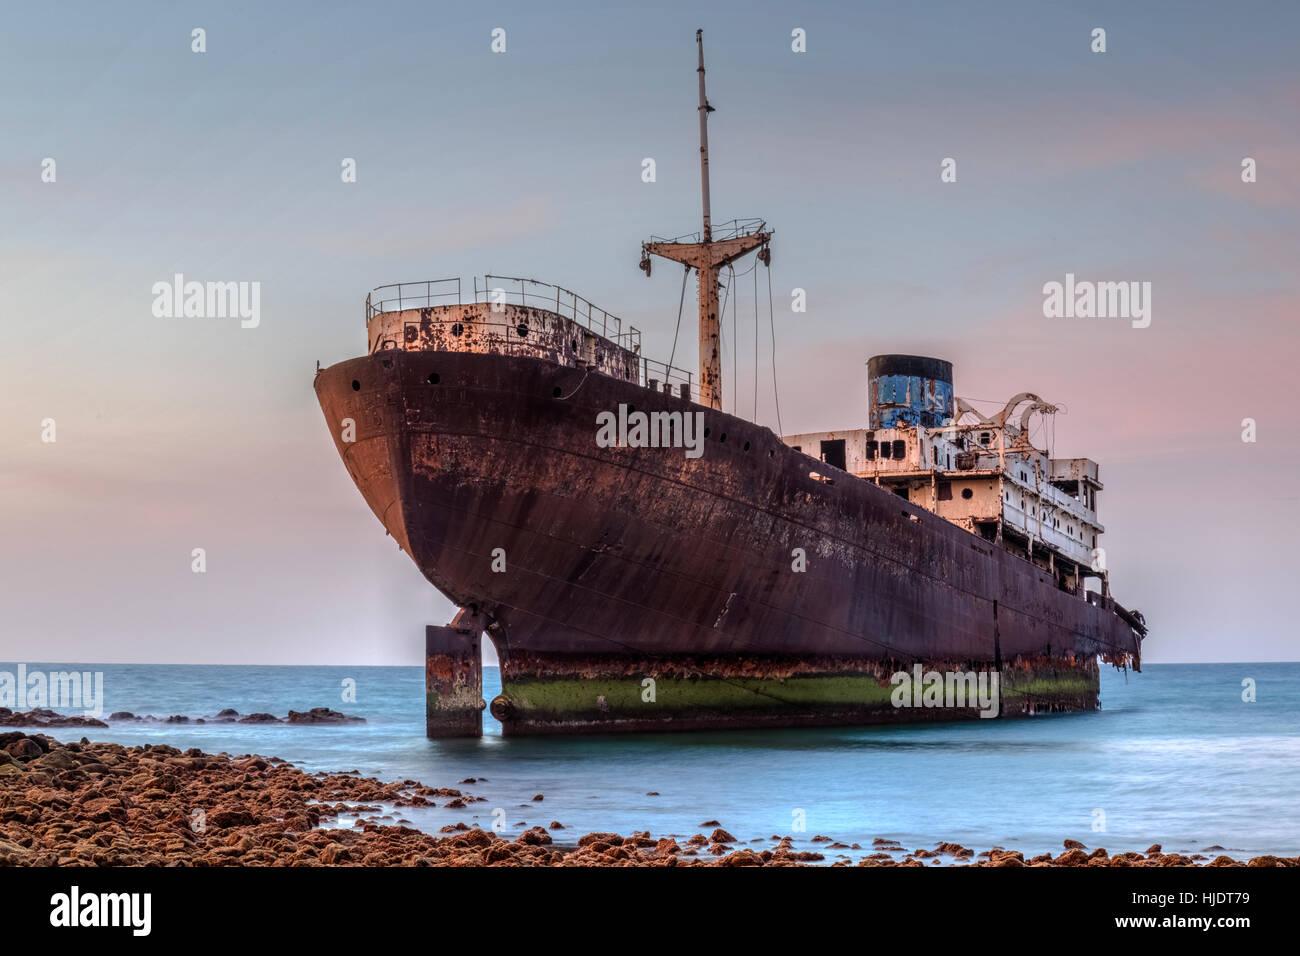 Shipwreck Temple Hall, Arrecife, Lanzarote, Canary Islands, Spain - Stock Image